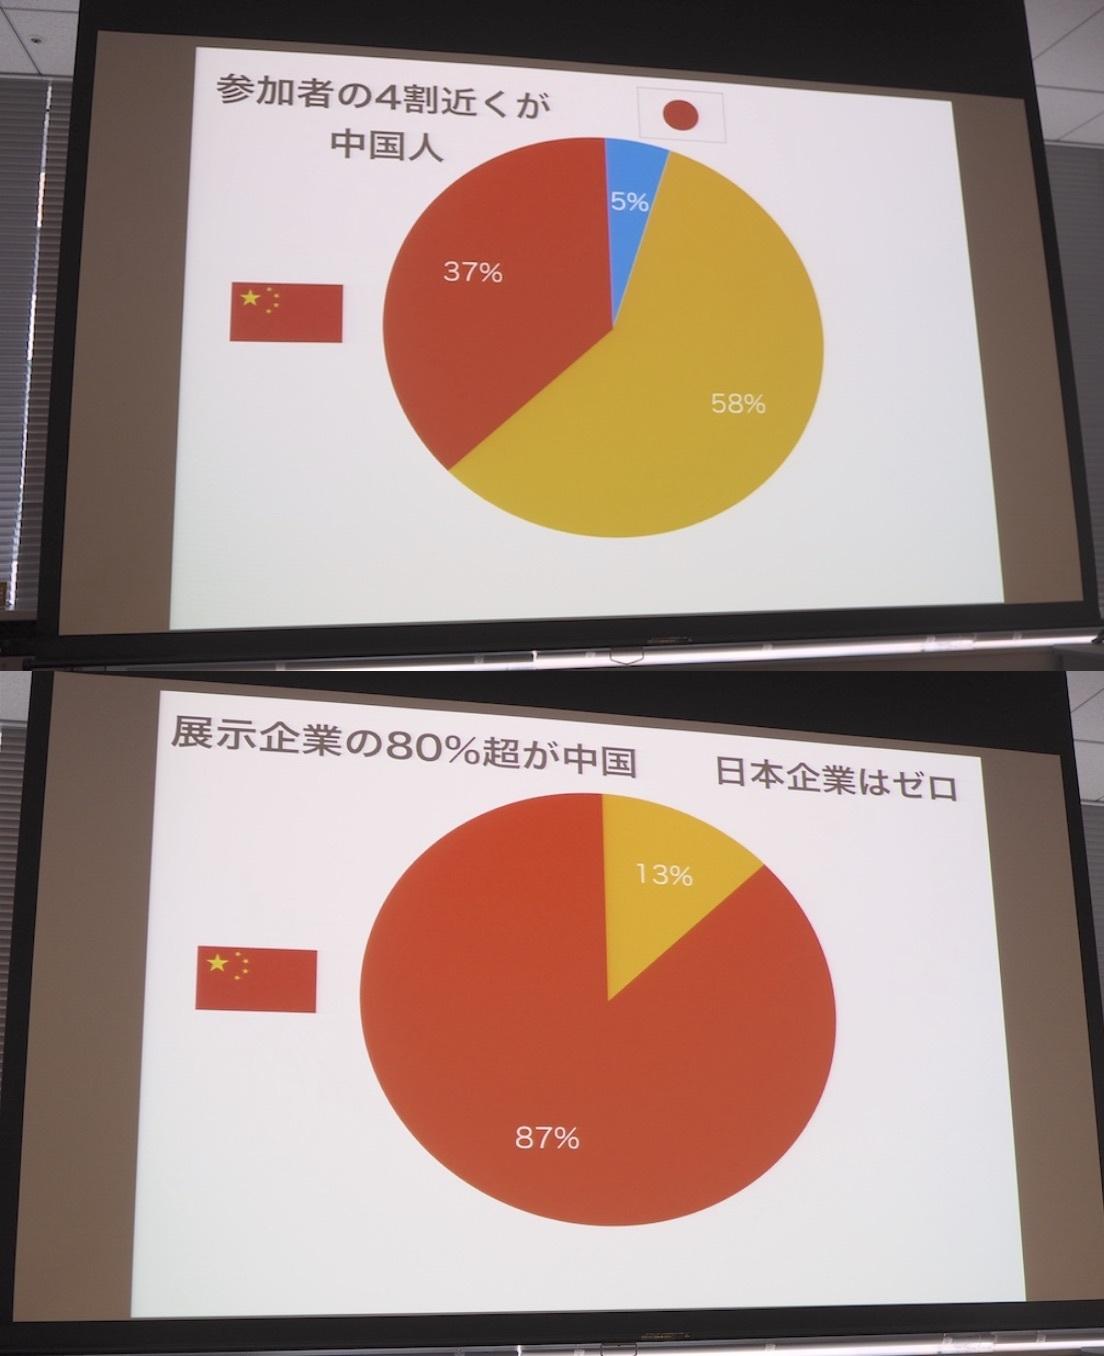 IJCAI2017の中国と日本のコミット状況。